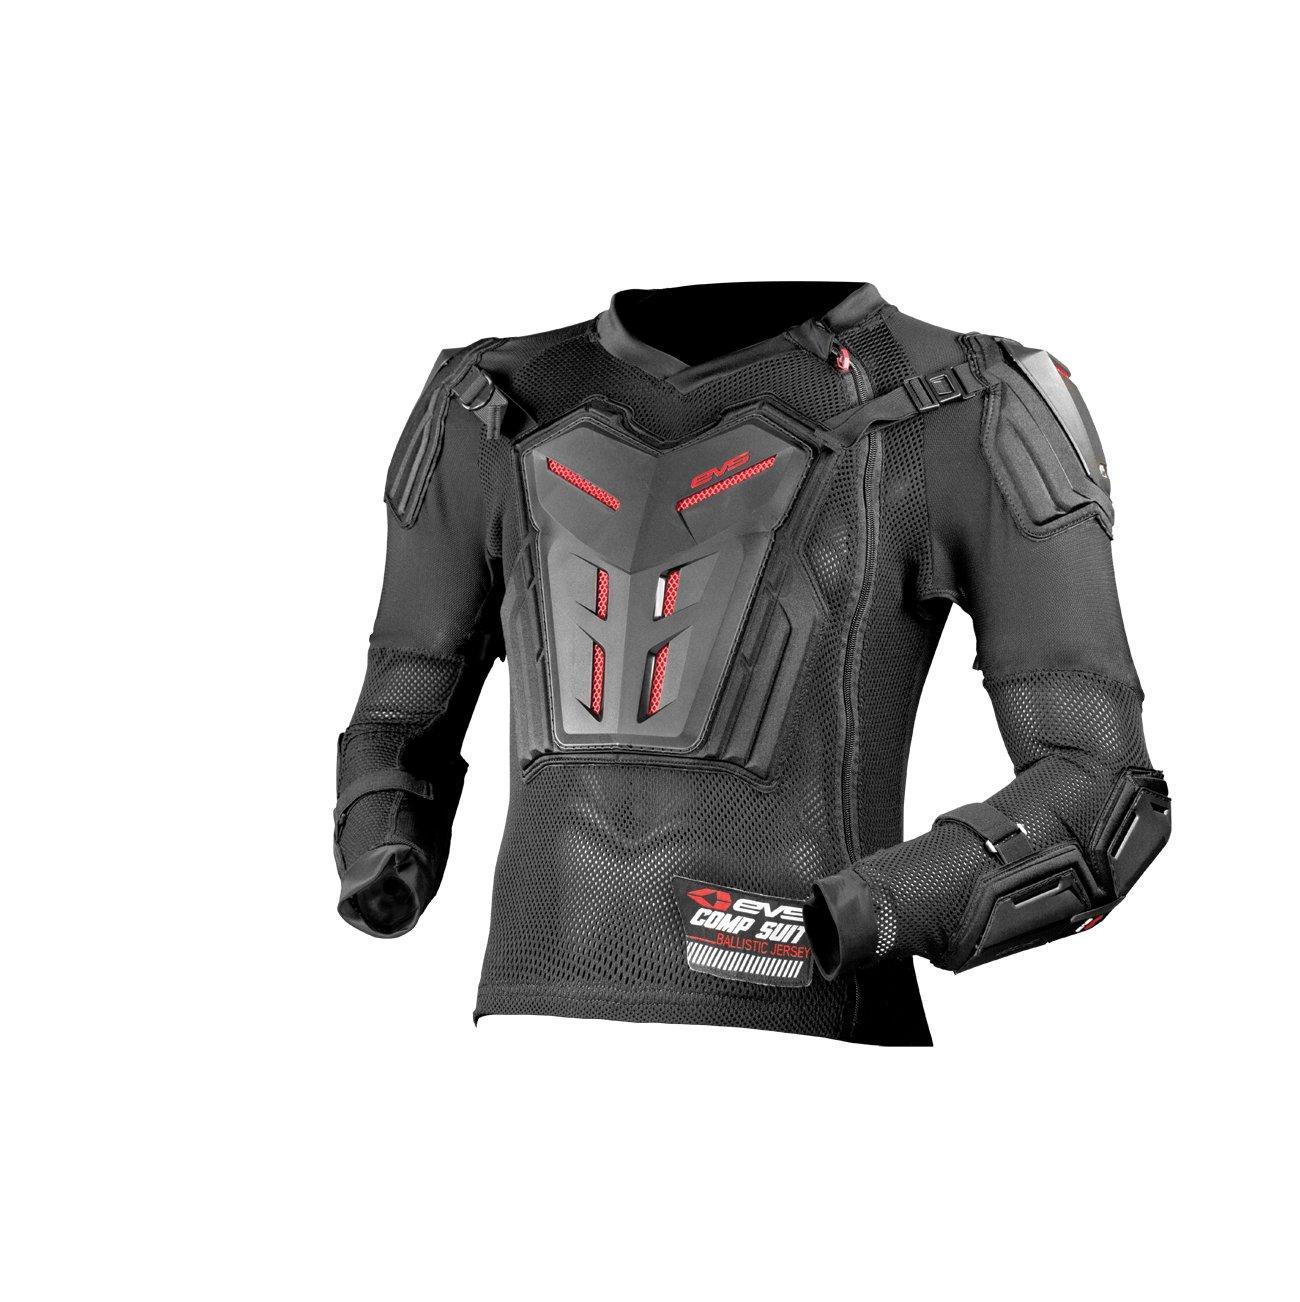 Black, Medium EVS Sports Unisex-Child Comp Suit Ce Version